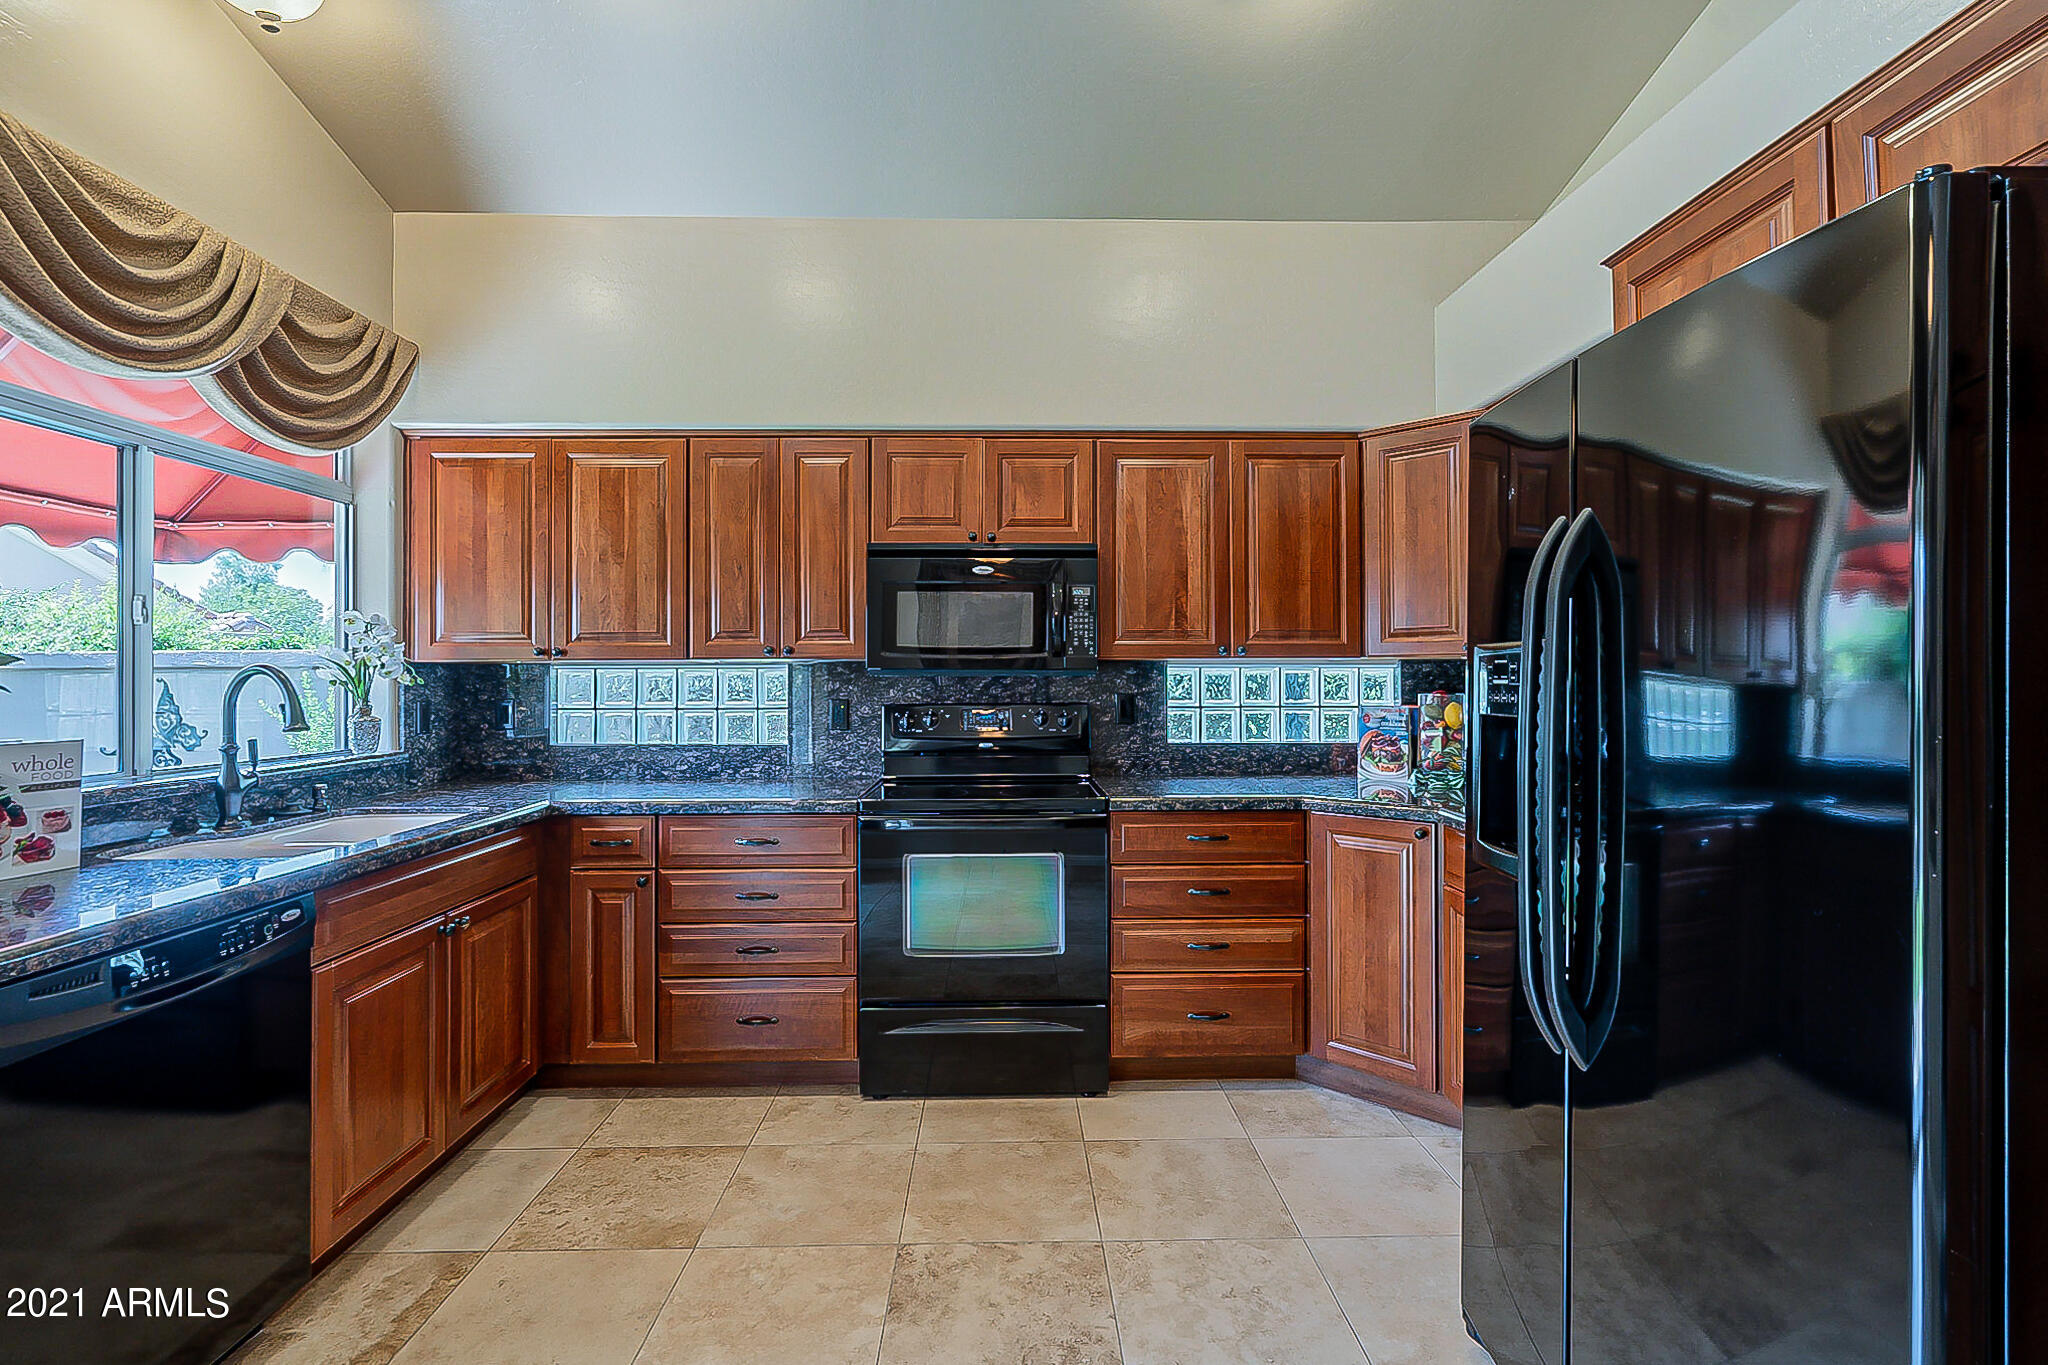 11857 PURDUE Avenue, Scottsdale, Arizona 85259, 2 Bedrooms Bedrooms, ,2 BathroomsBathrooms,Residential,For Sale,PURDUE,6294097